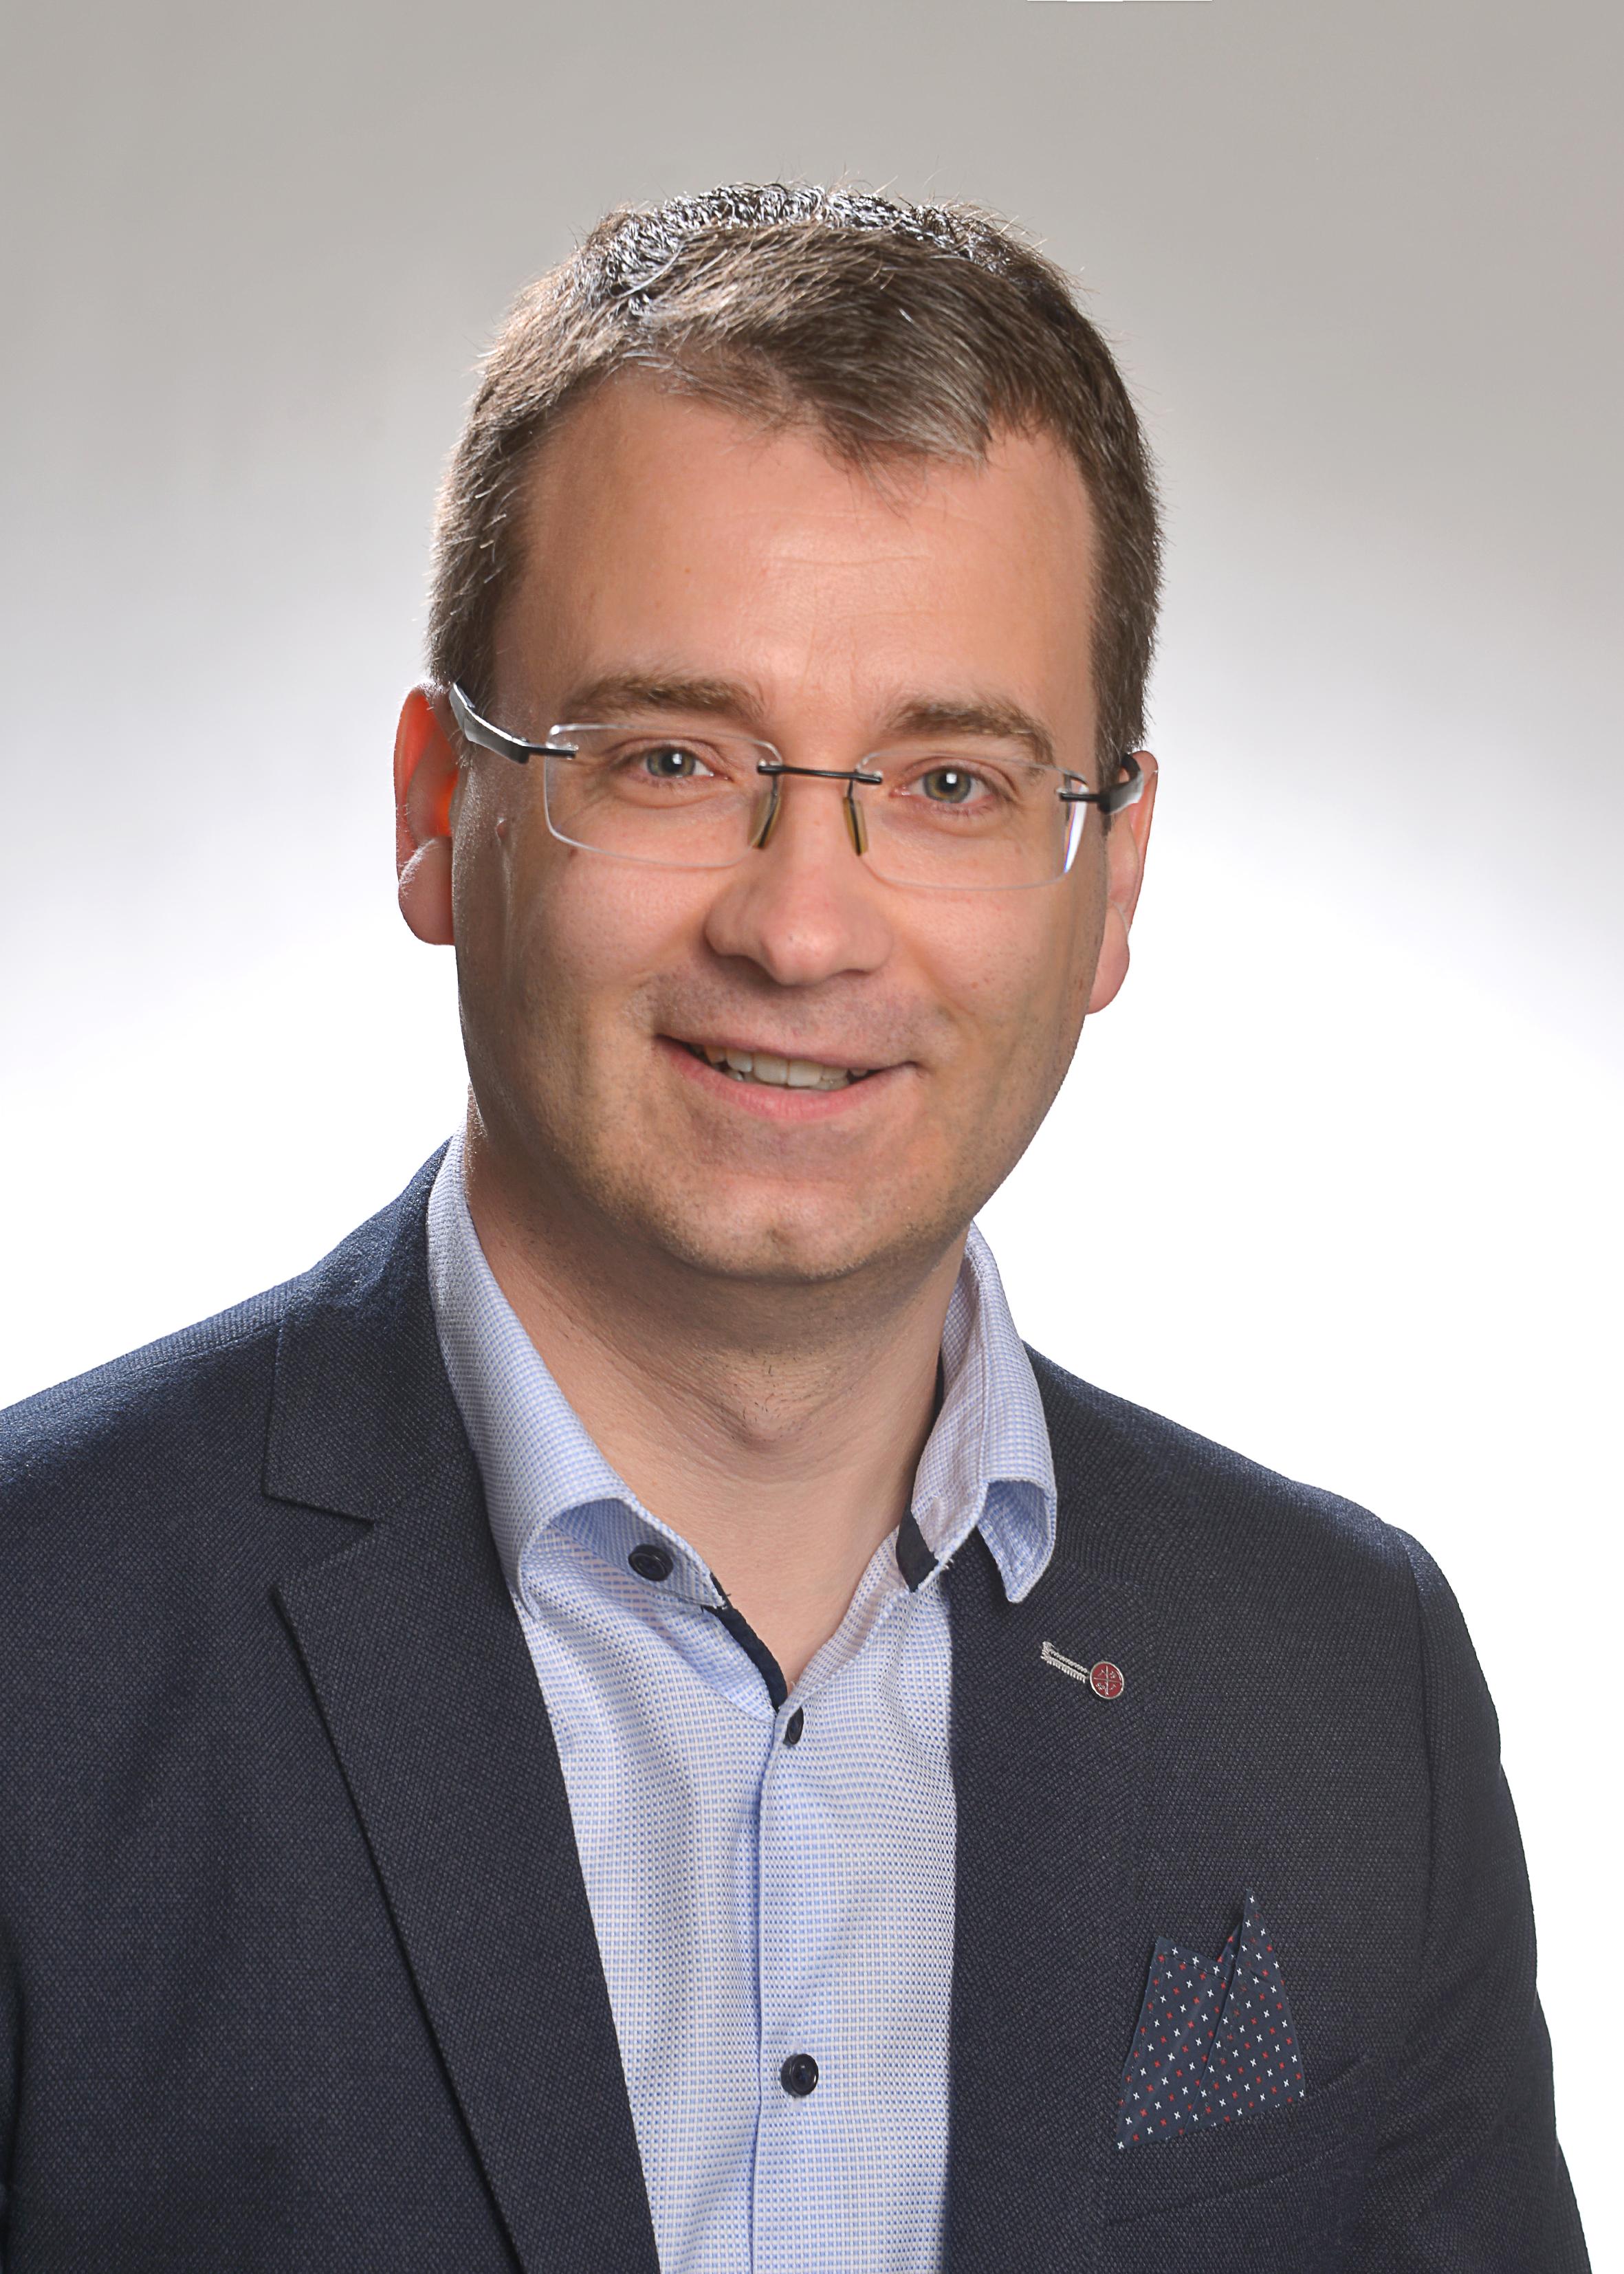 Christian Hebestadt